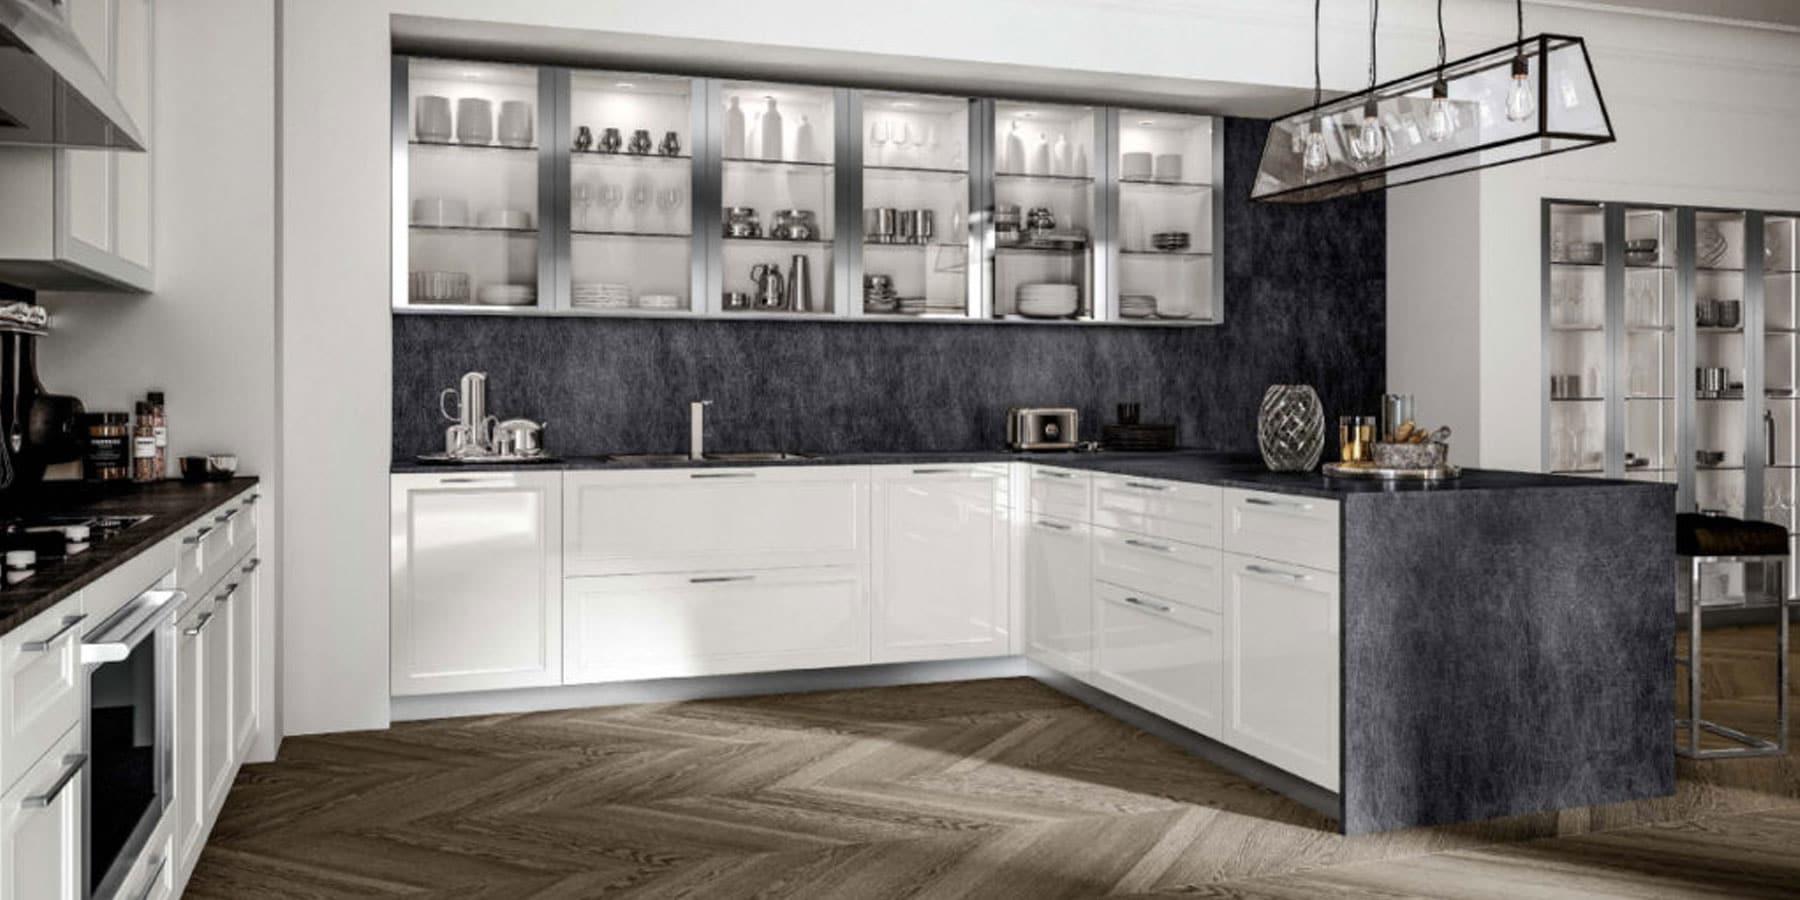 Dorchena Interiors by Istoria Black & Wood Composit